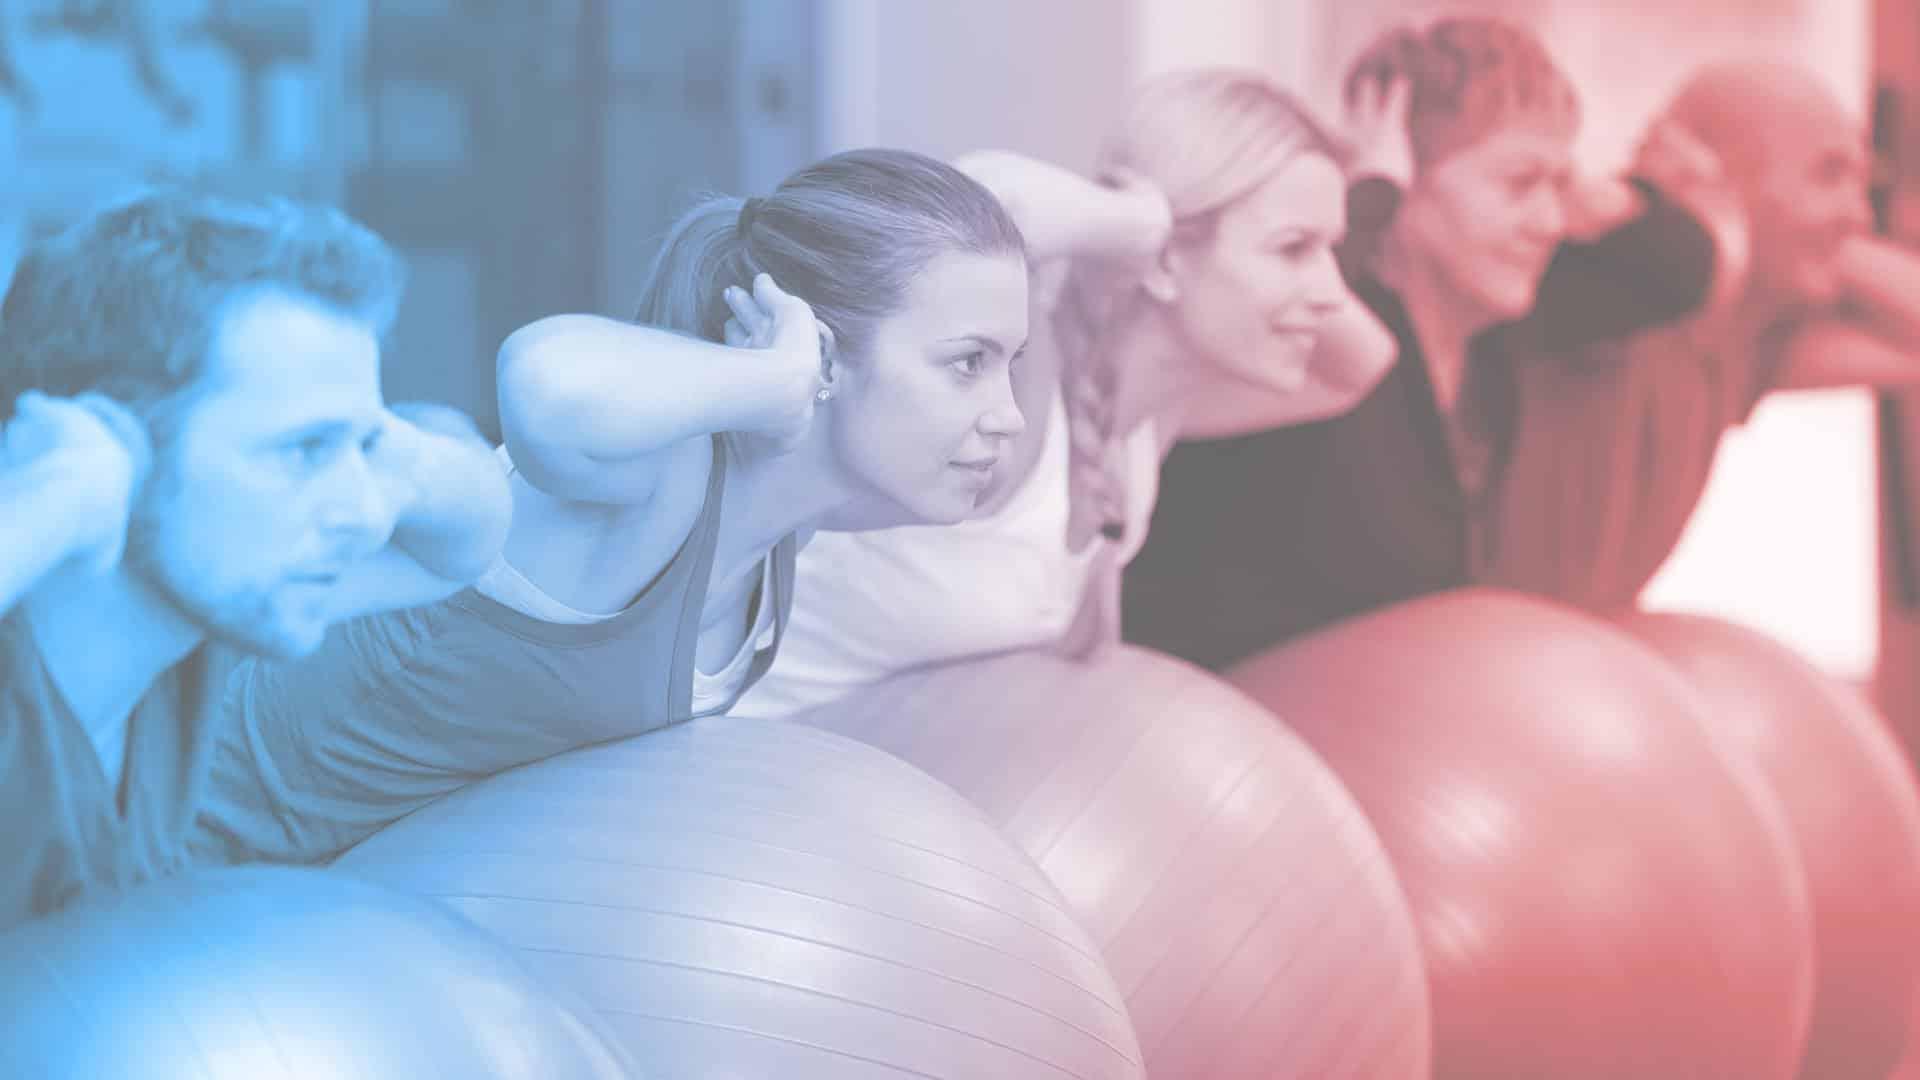 People exercising using exercise balls